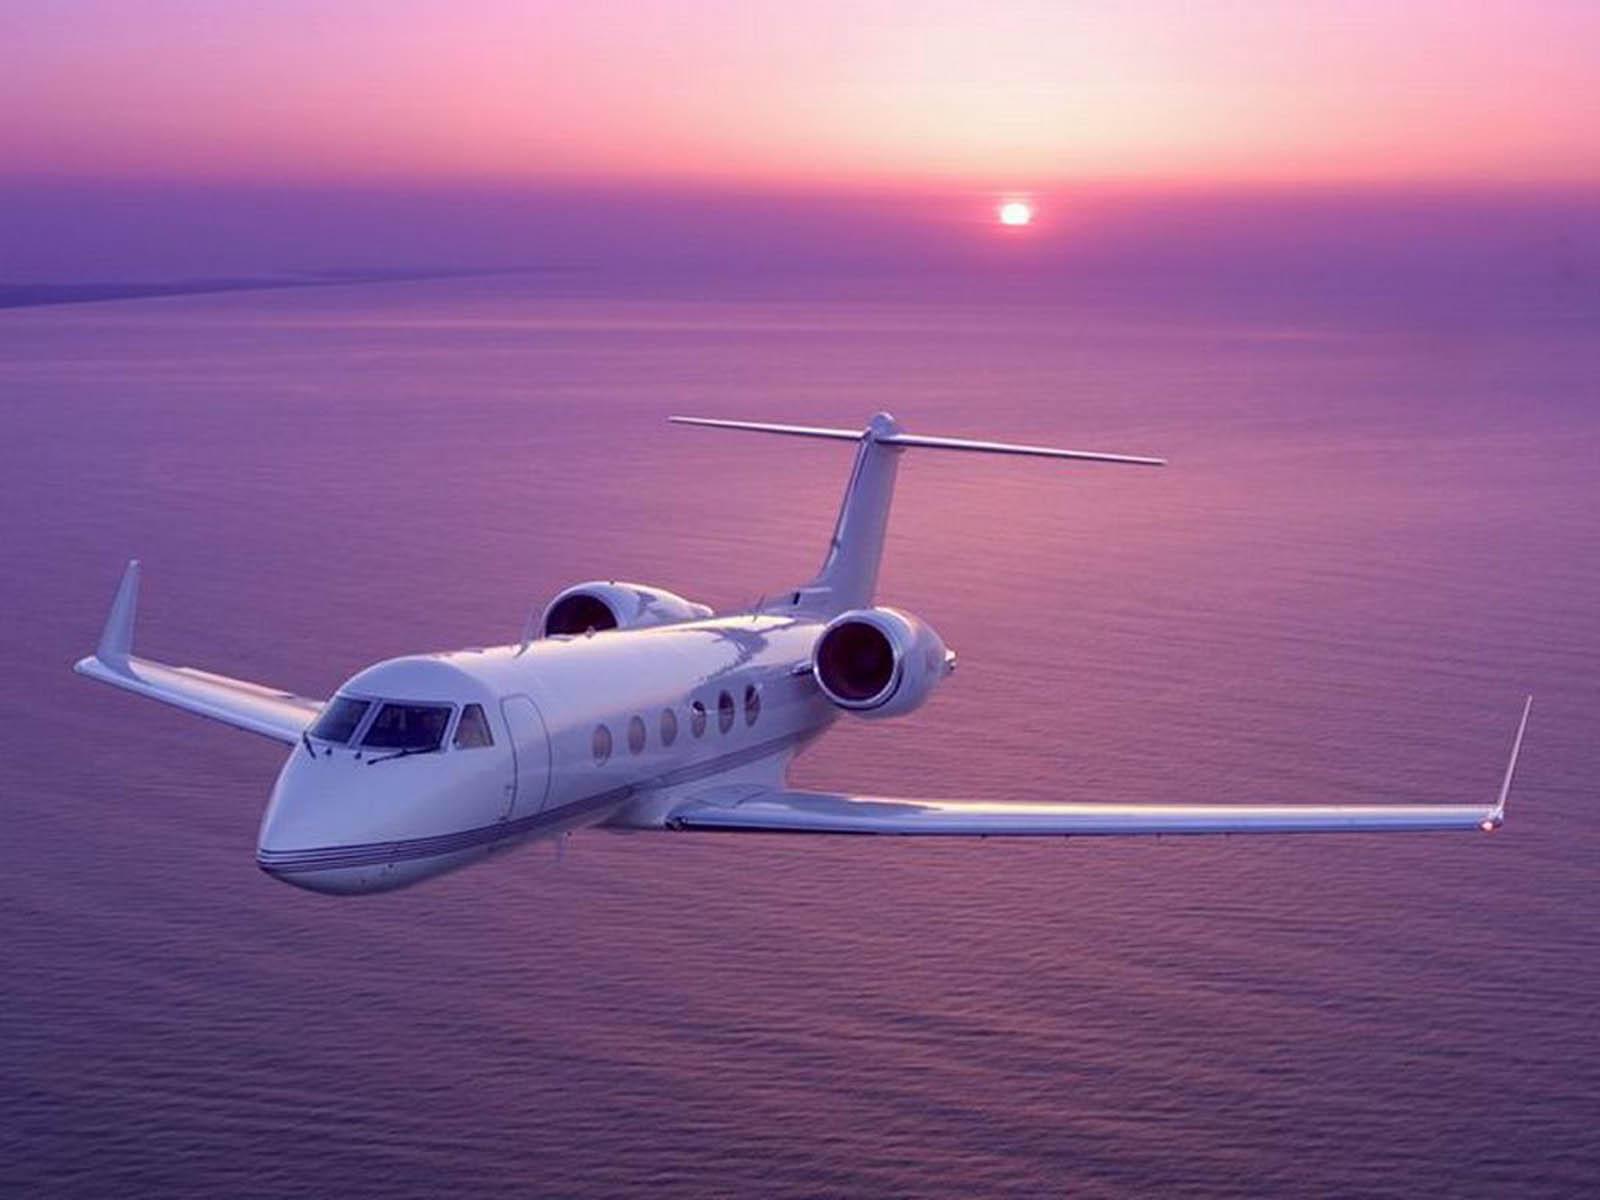 Wallpaper Gulfstream V Aircraft Paos